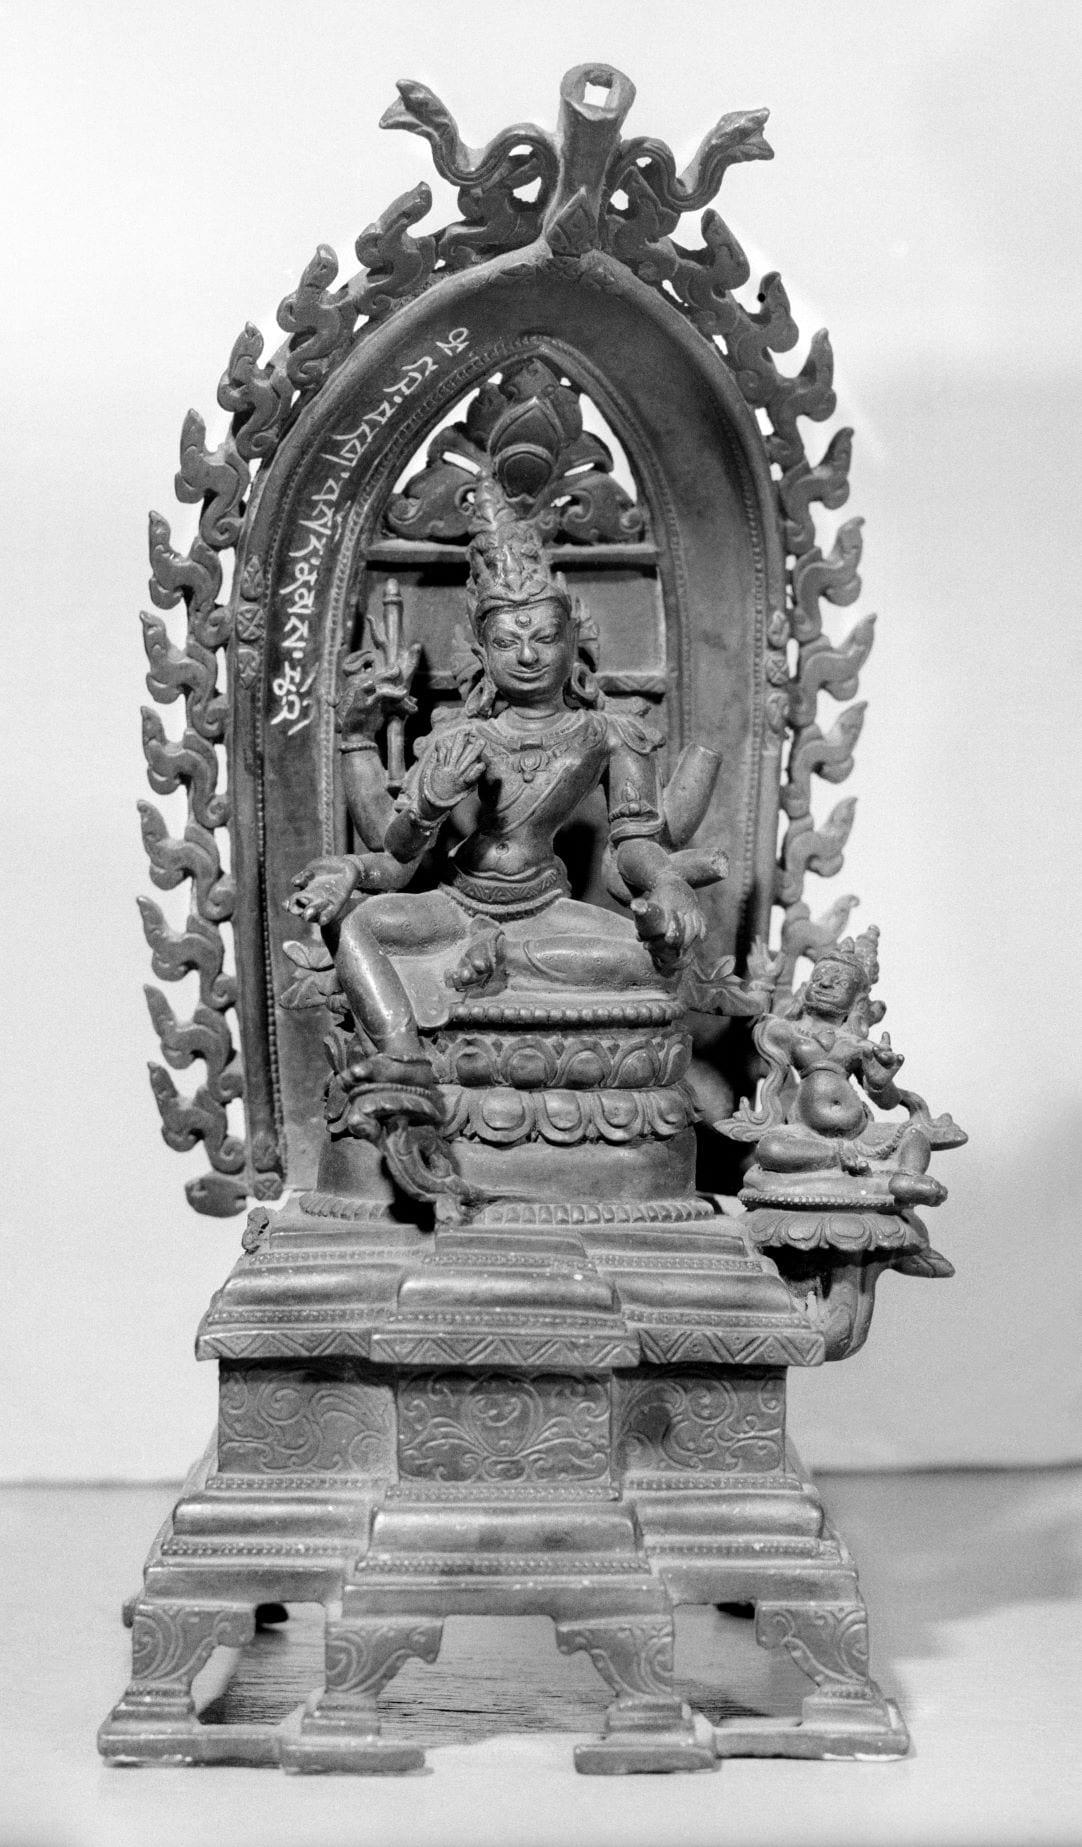 Bronze sculpture of Maitreya Bodhisattva, seated